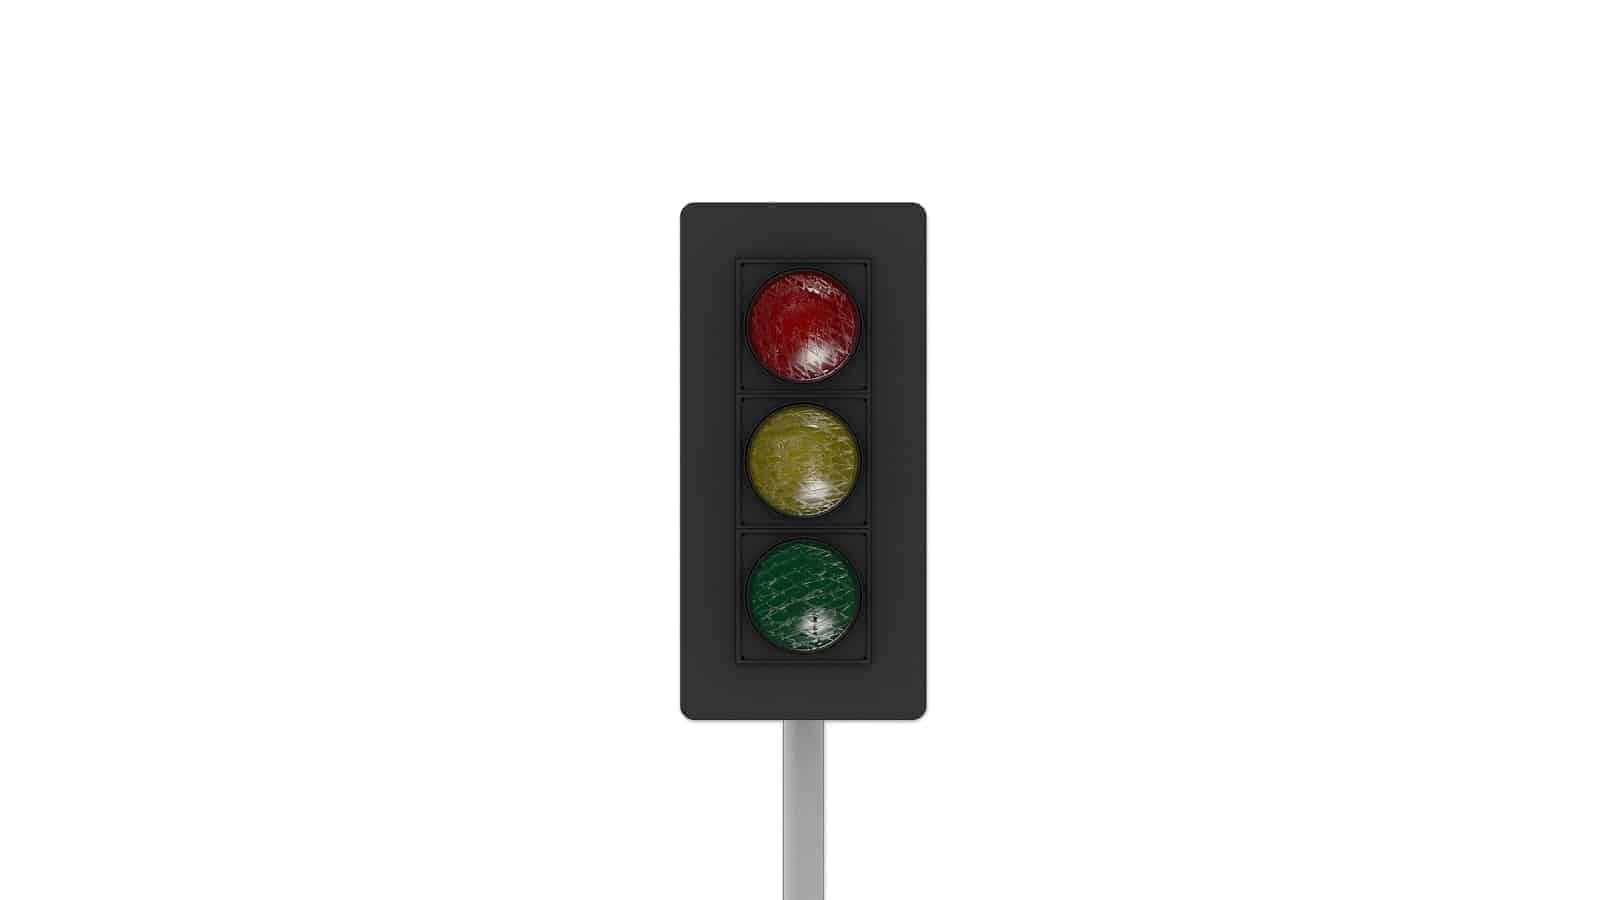 Malfunctioning traffic lights